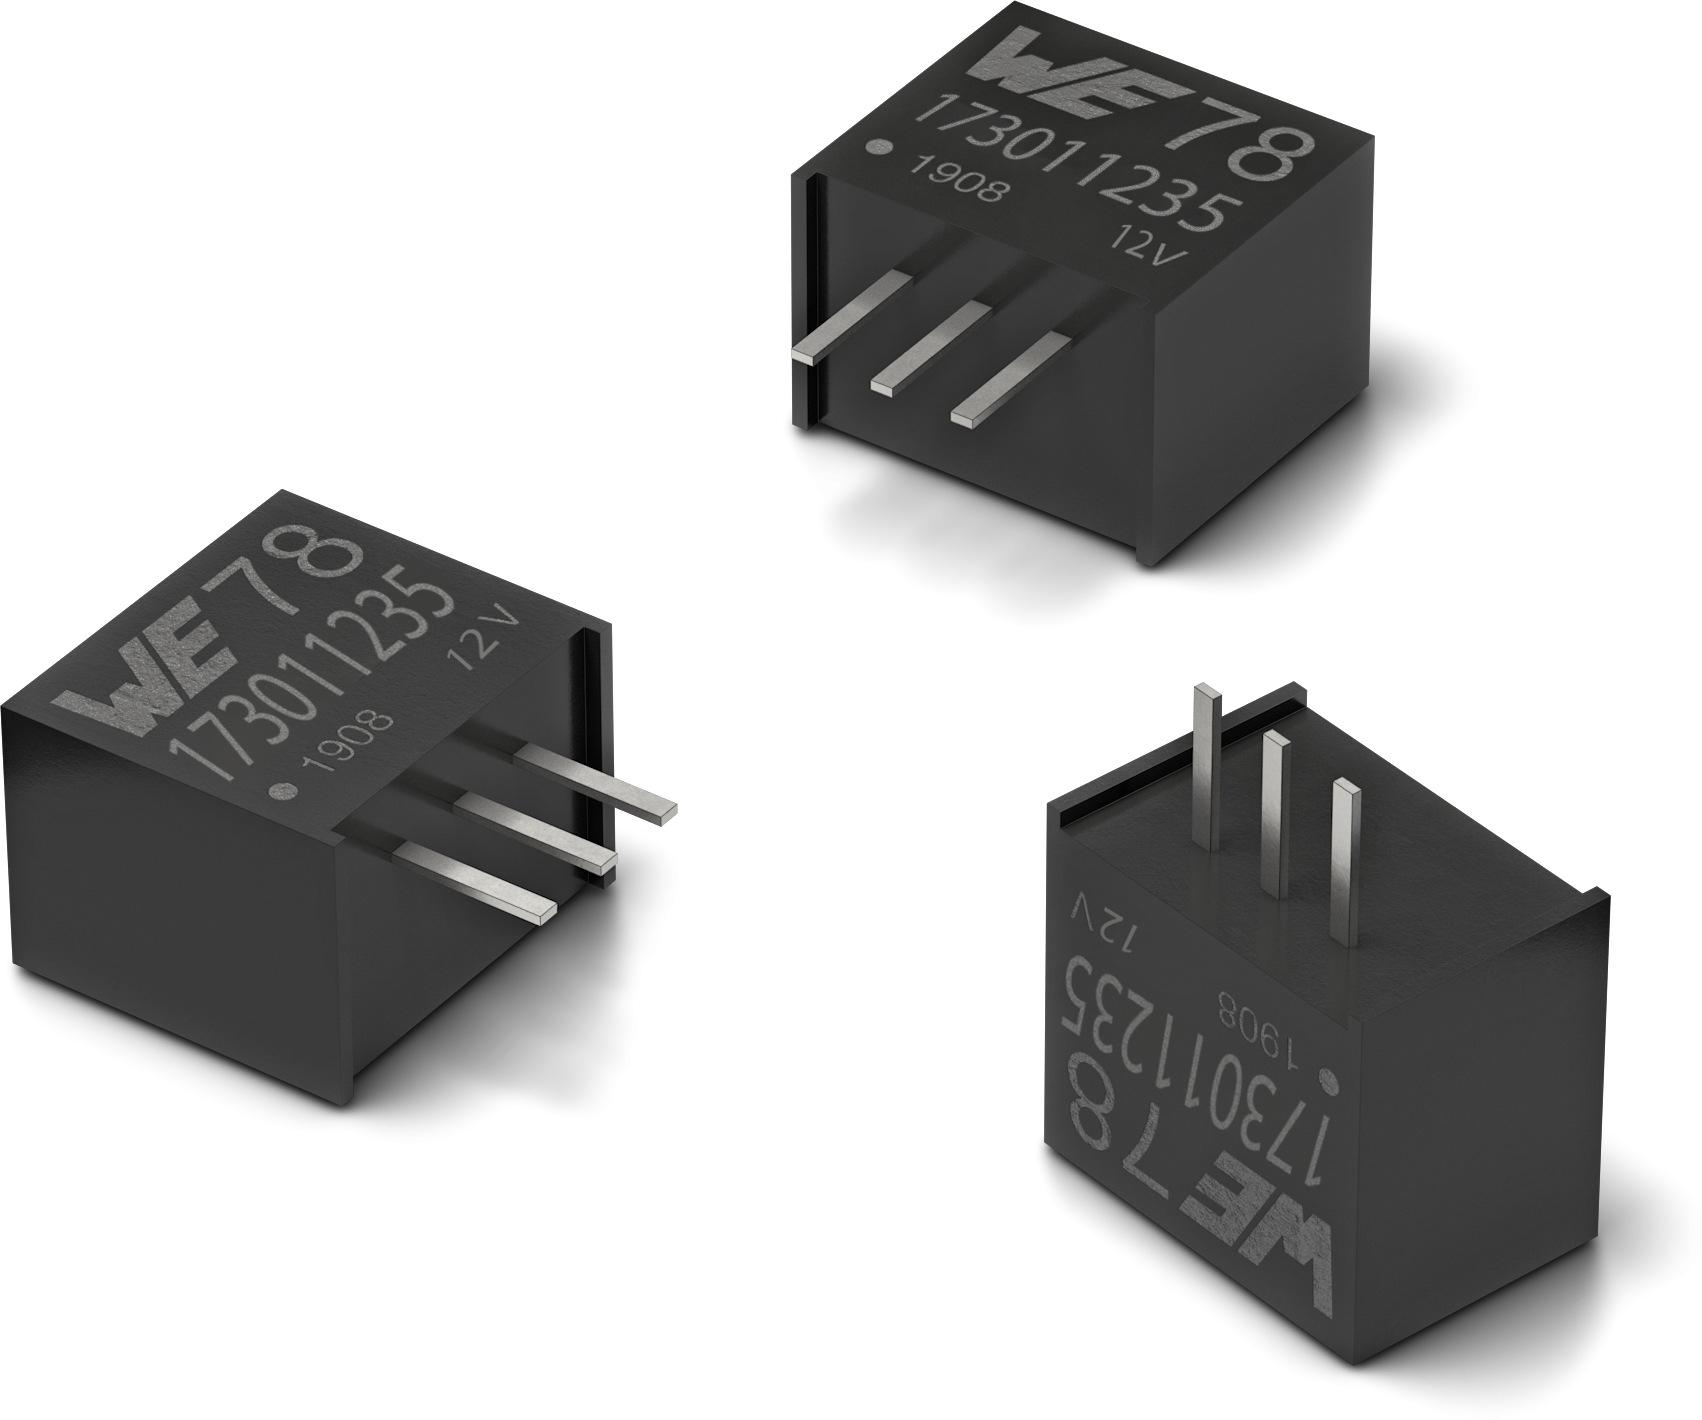 Würth Elektronik extends its MagI³C-FDSM-36-V family with a 12 V output voltage version